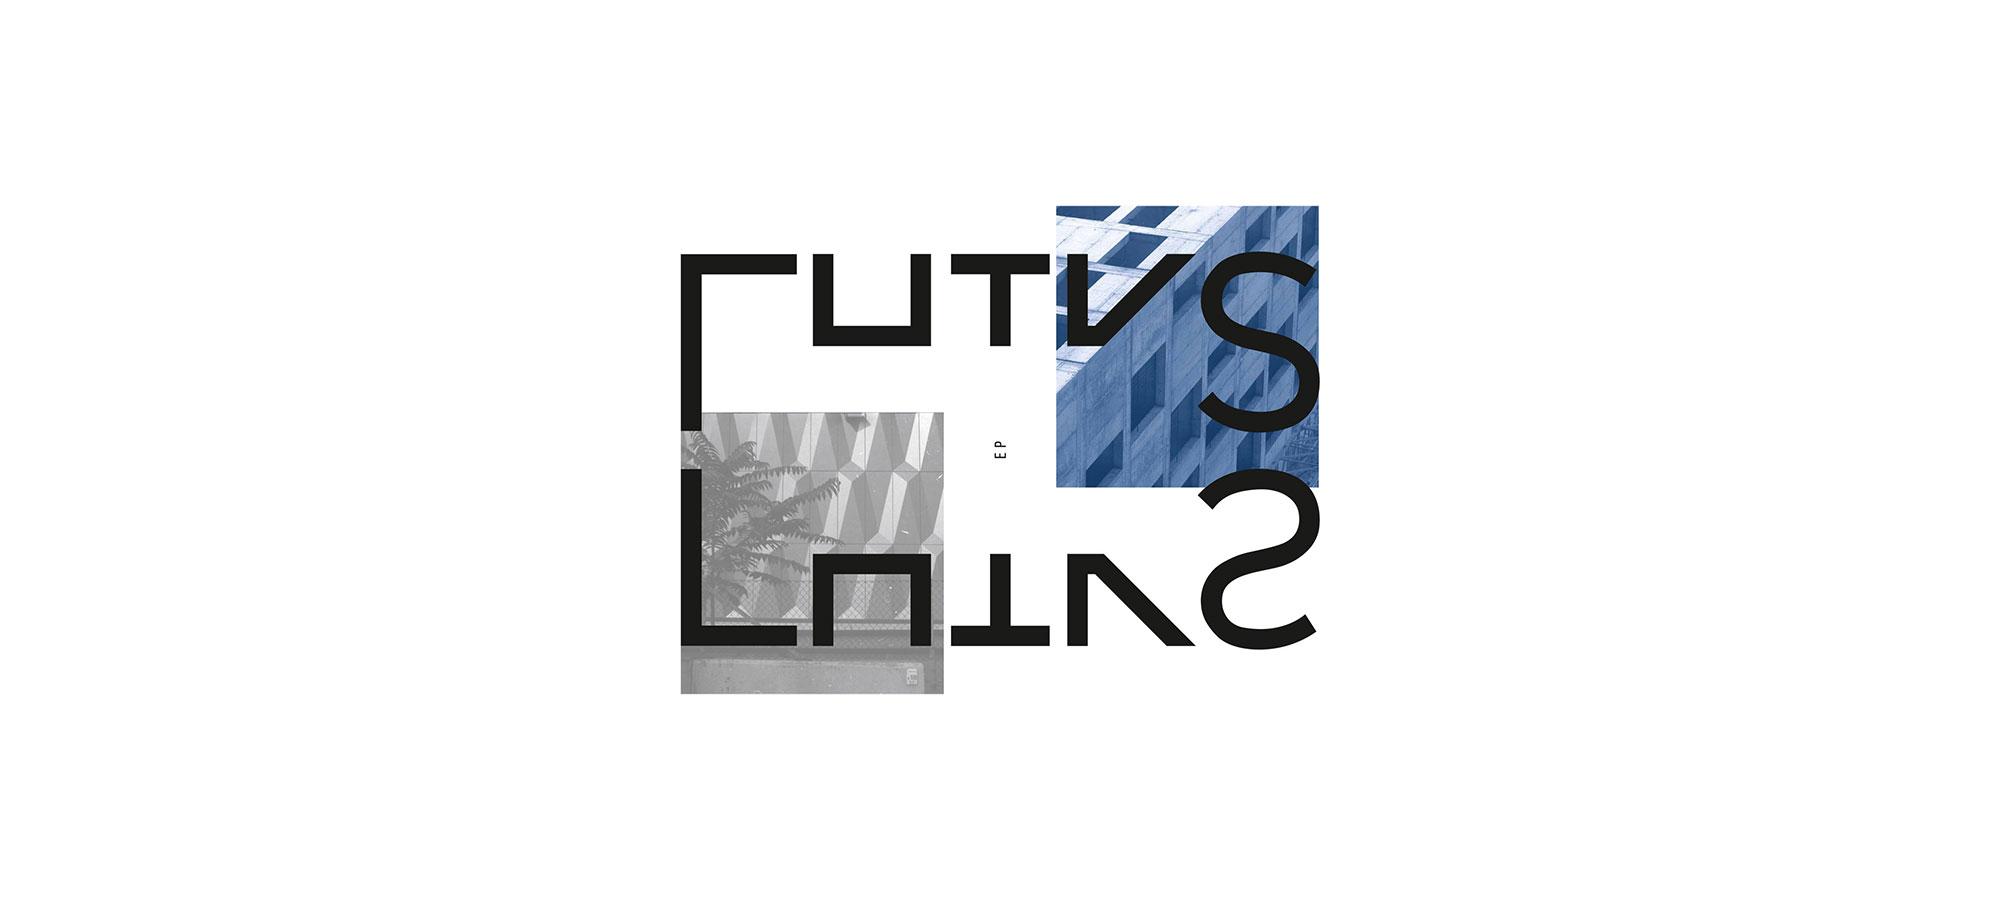 Lenny De Luca - New EP LHIKS Remixes - Out Now ! chill electro house hip hop music